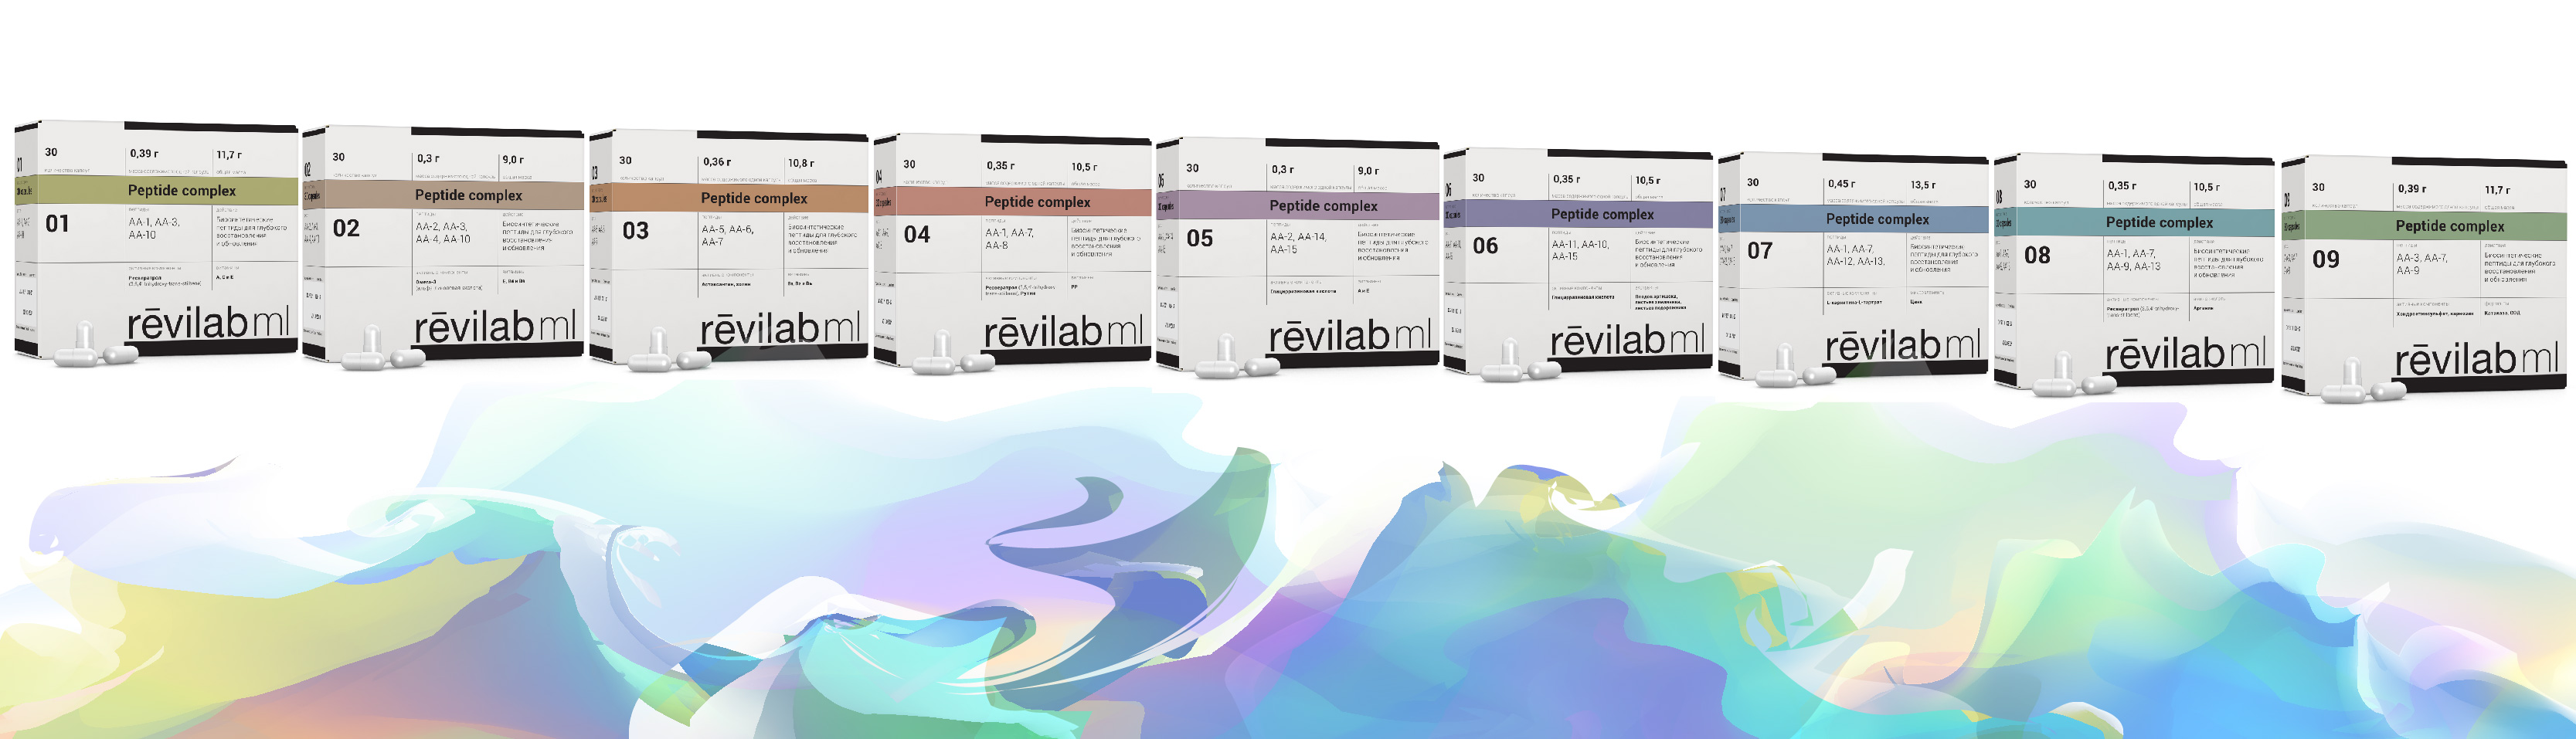 RevilabML